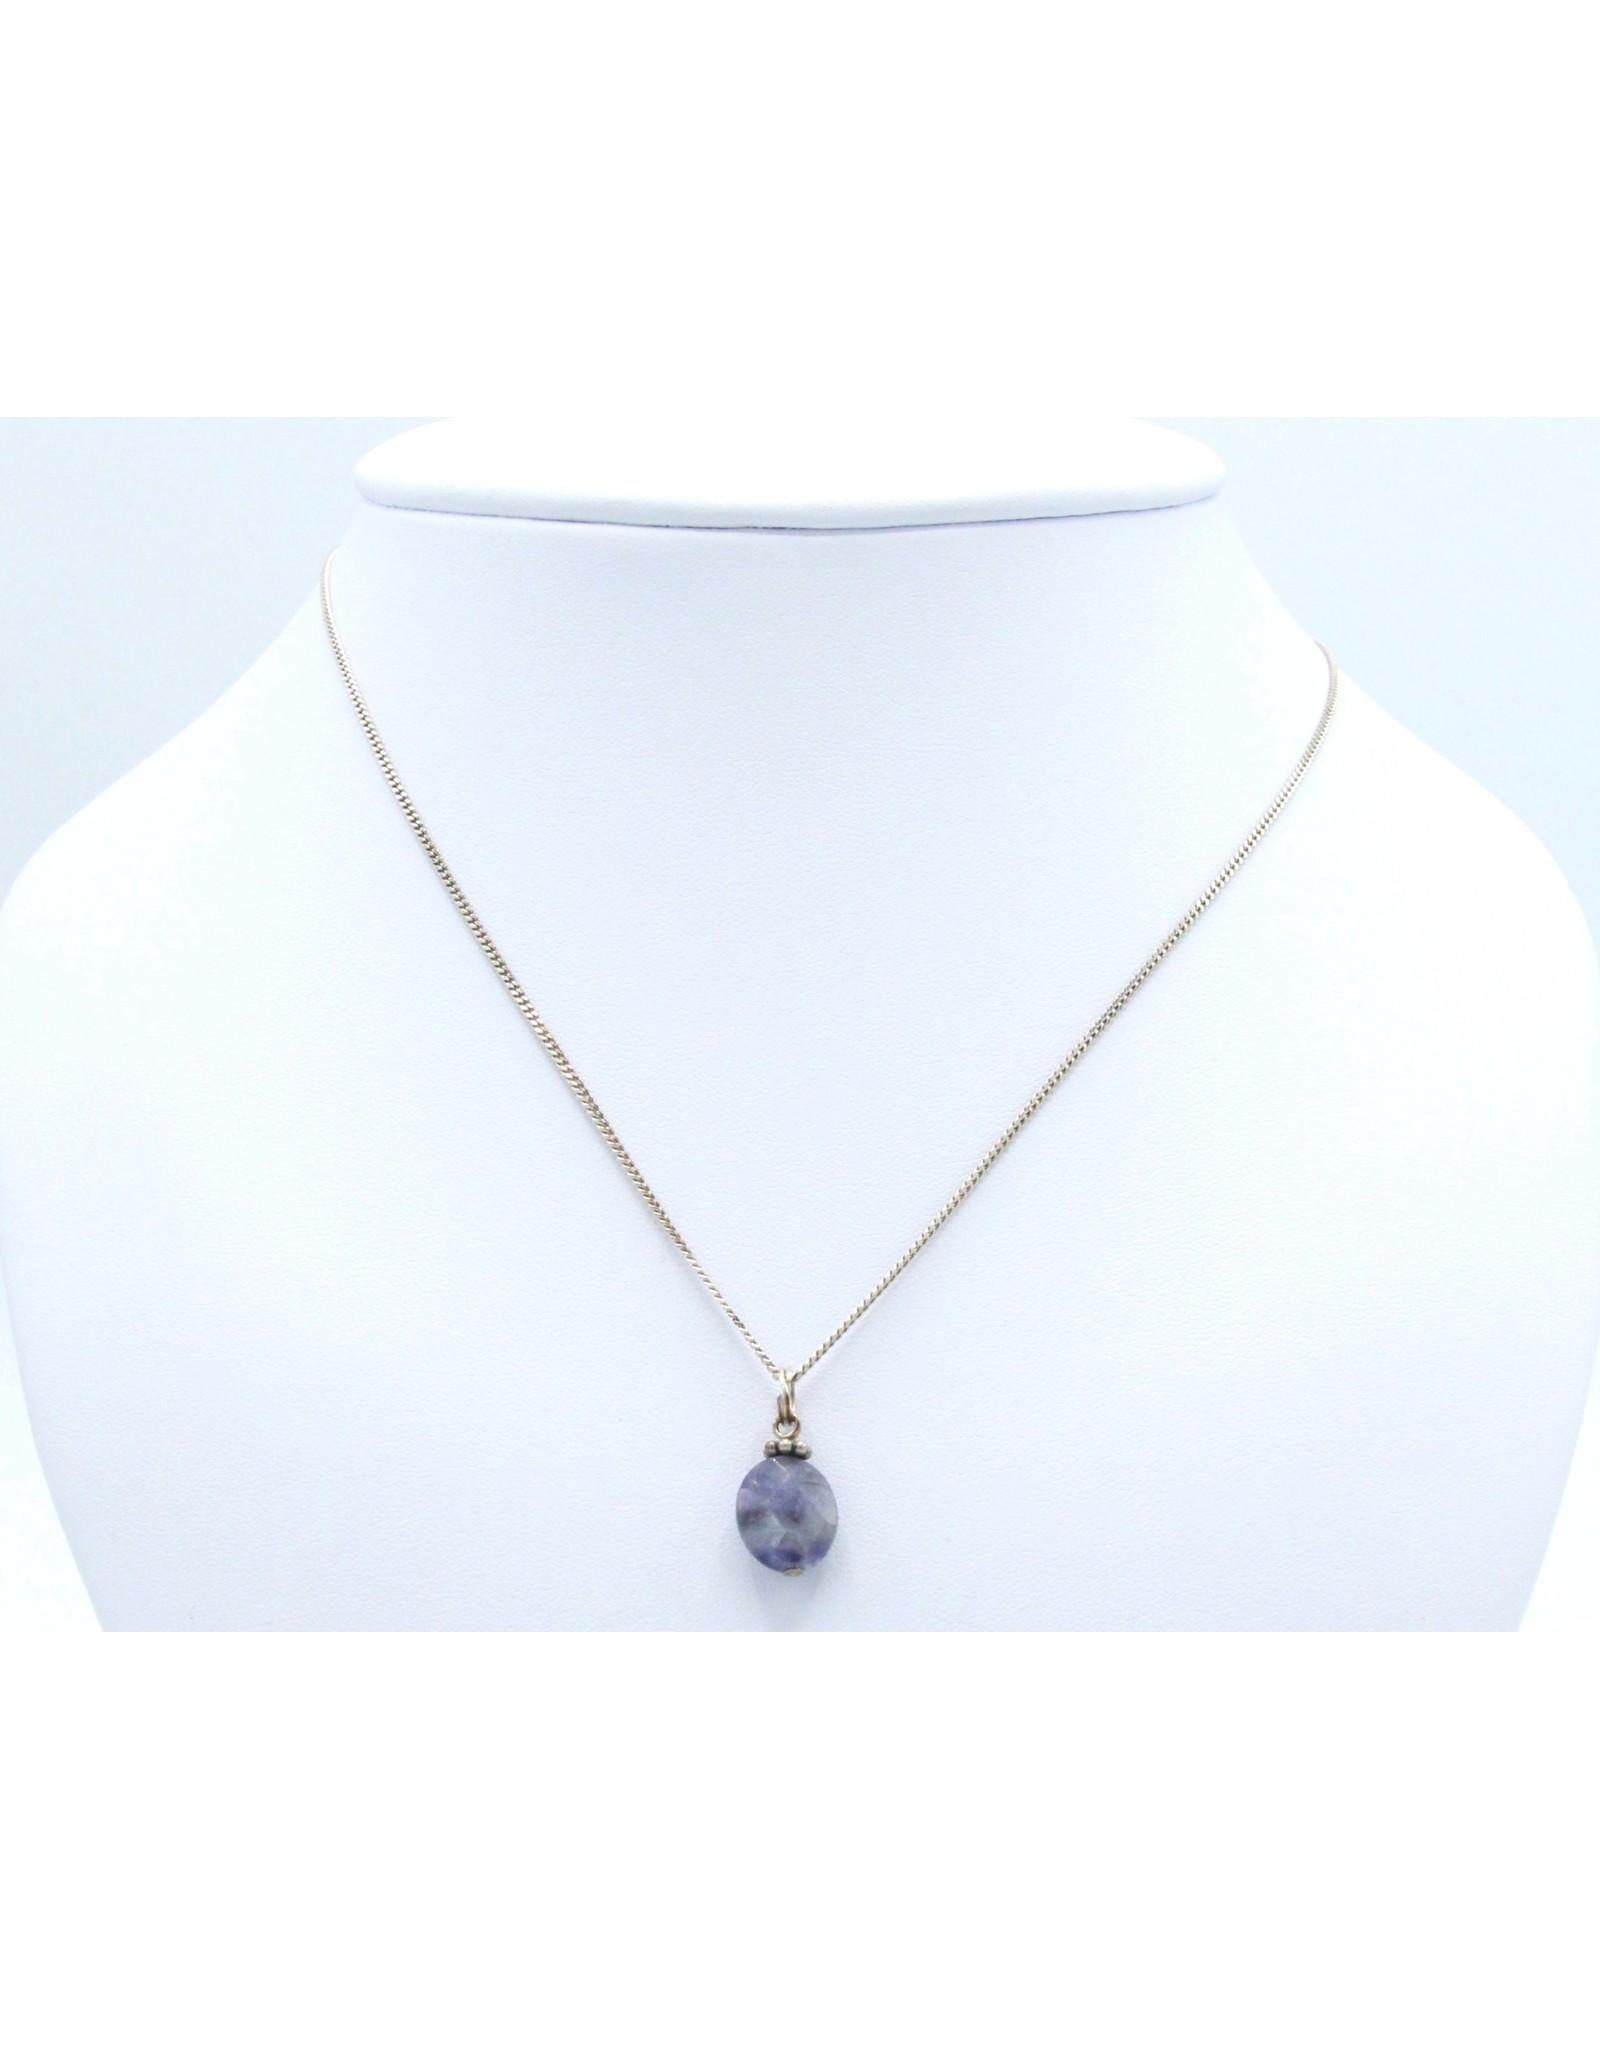 Scapolite Necklace - NSCAP09